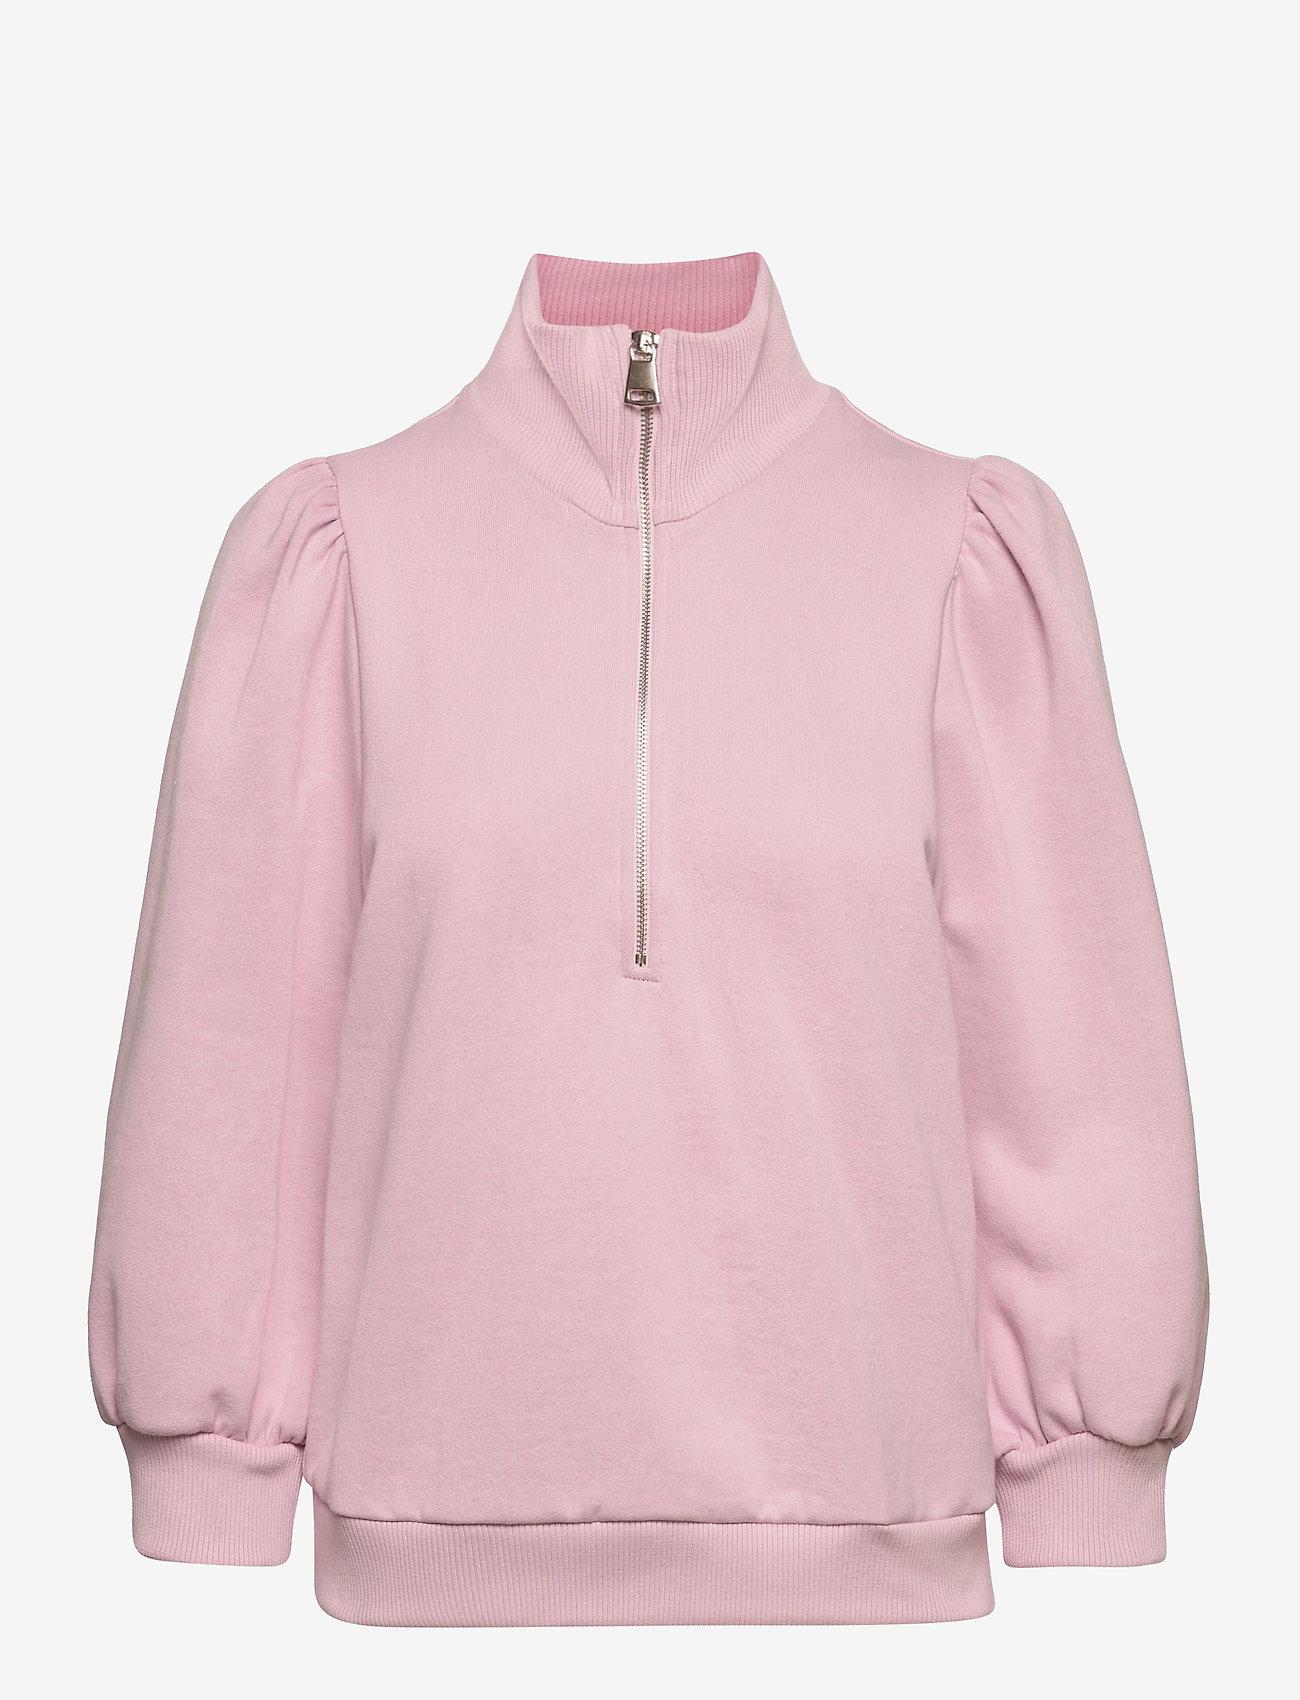 Gestuz - NankitaGZ ss zipper sweatshirt - sweatshirts & hoodies - fragrant lilac - 1